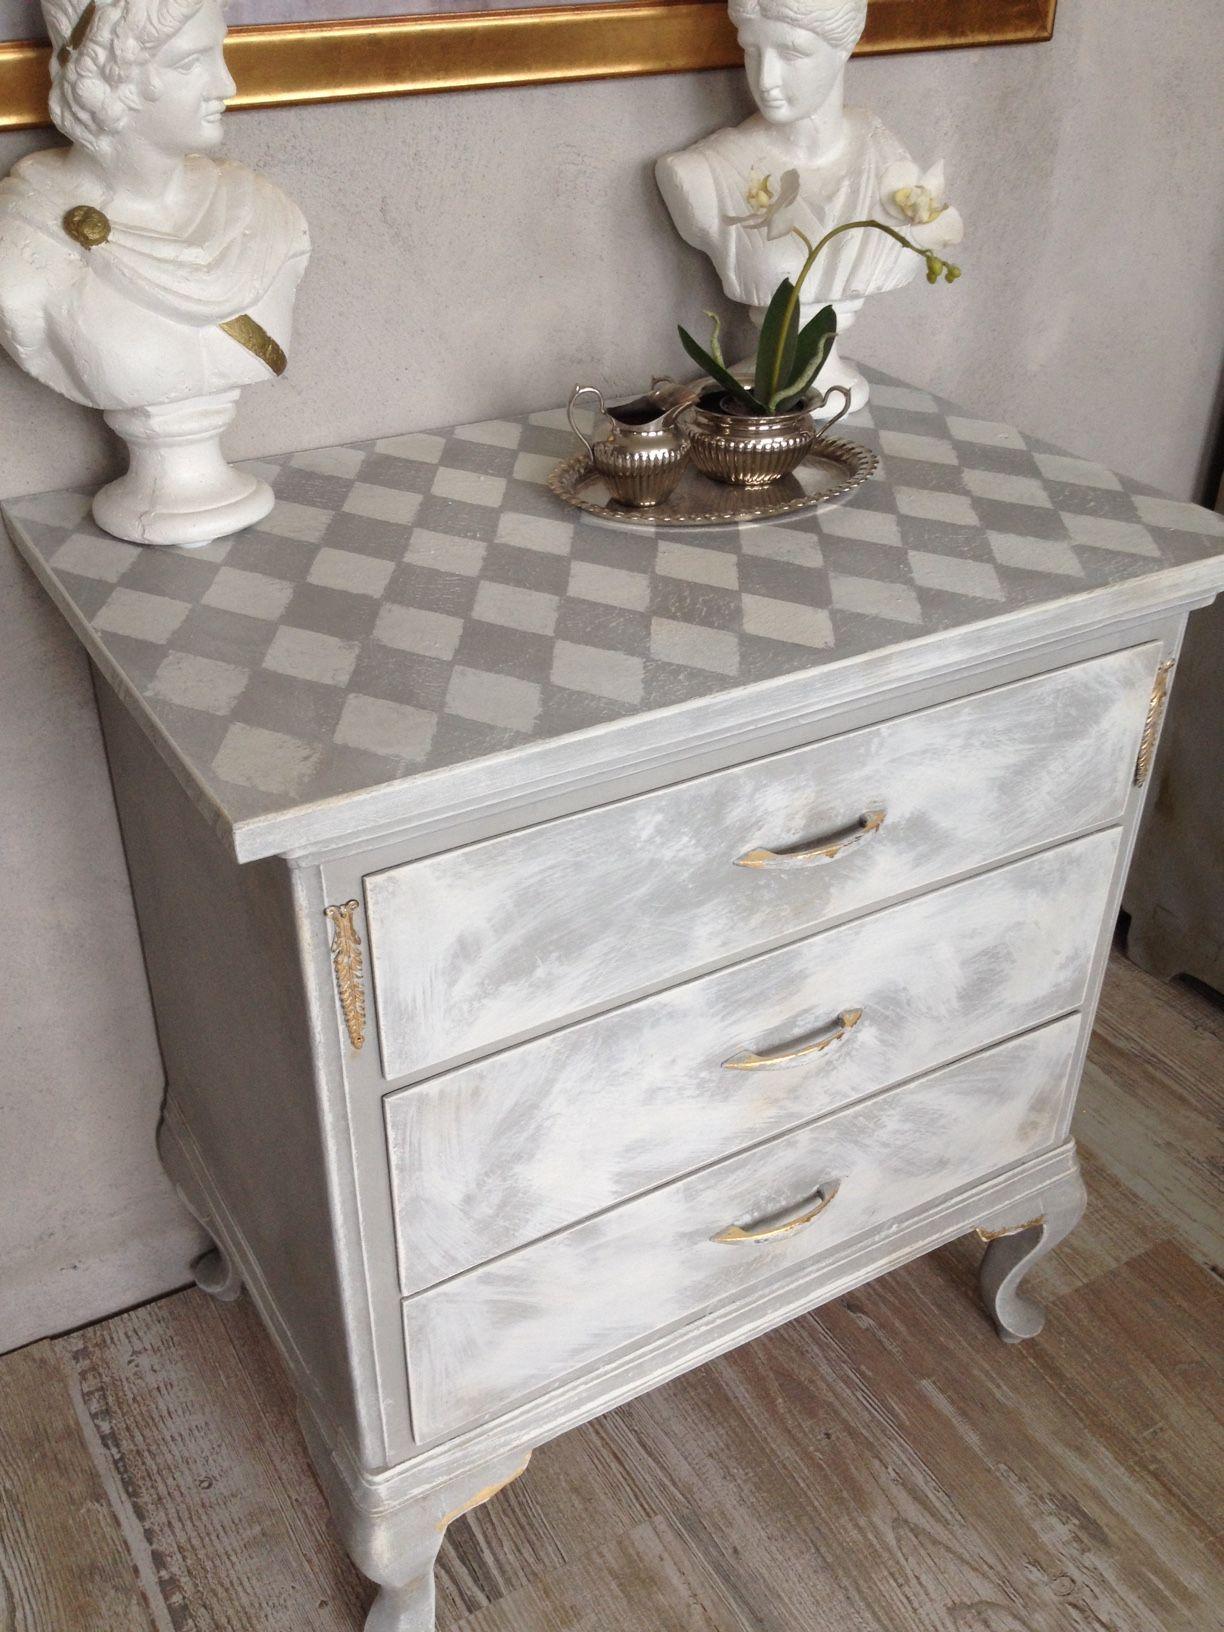 Hervorragend Kommode Möbel shabby chic grau weiß Raute vintage antik  IK44